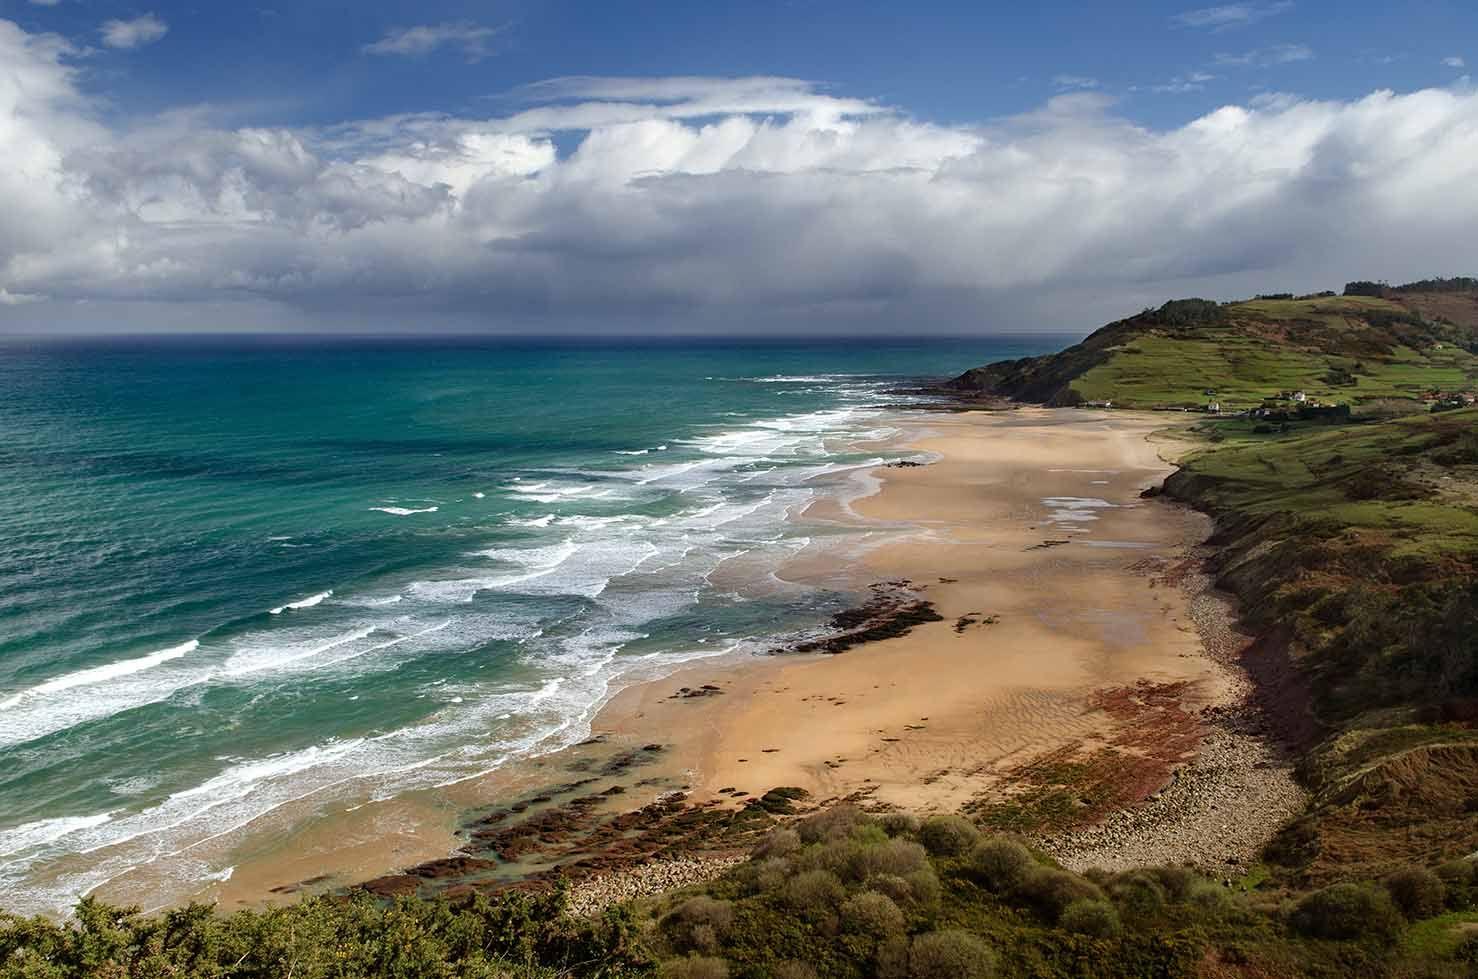 playa de vega asturias